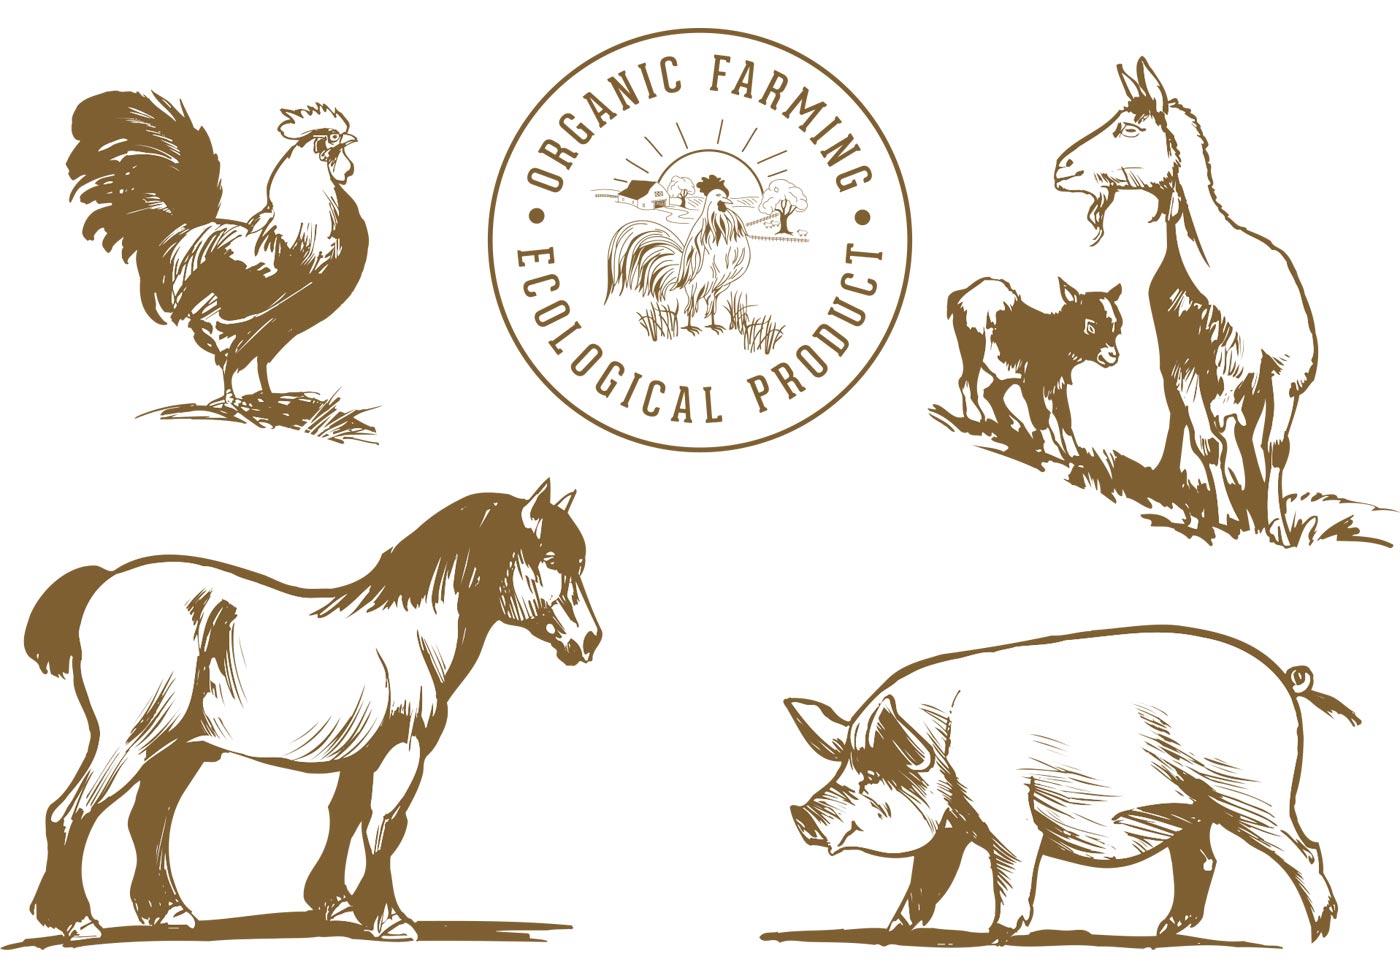 farm animals vector pack - download free vector art, stock graphics